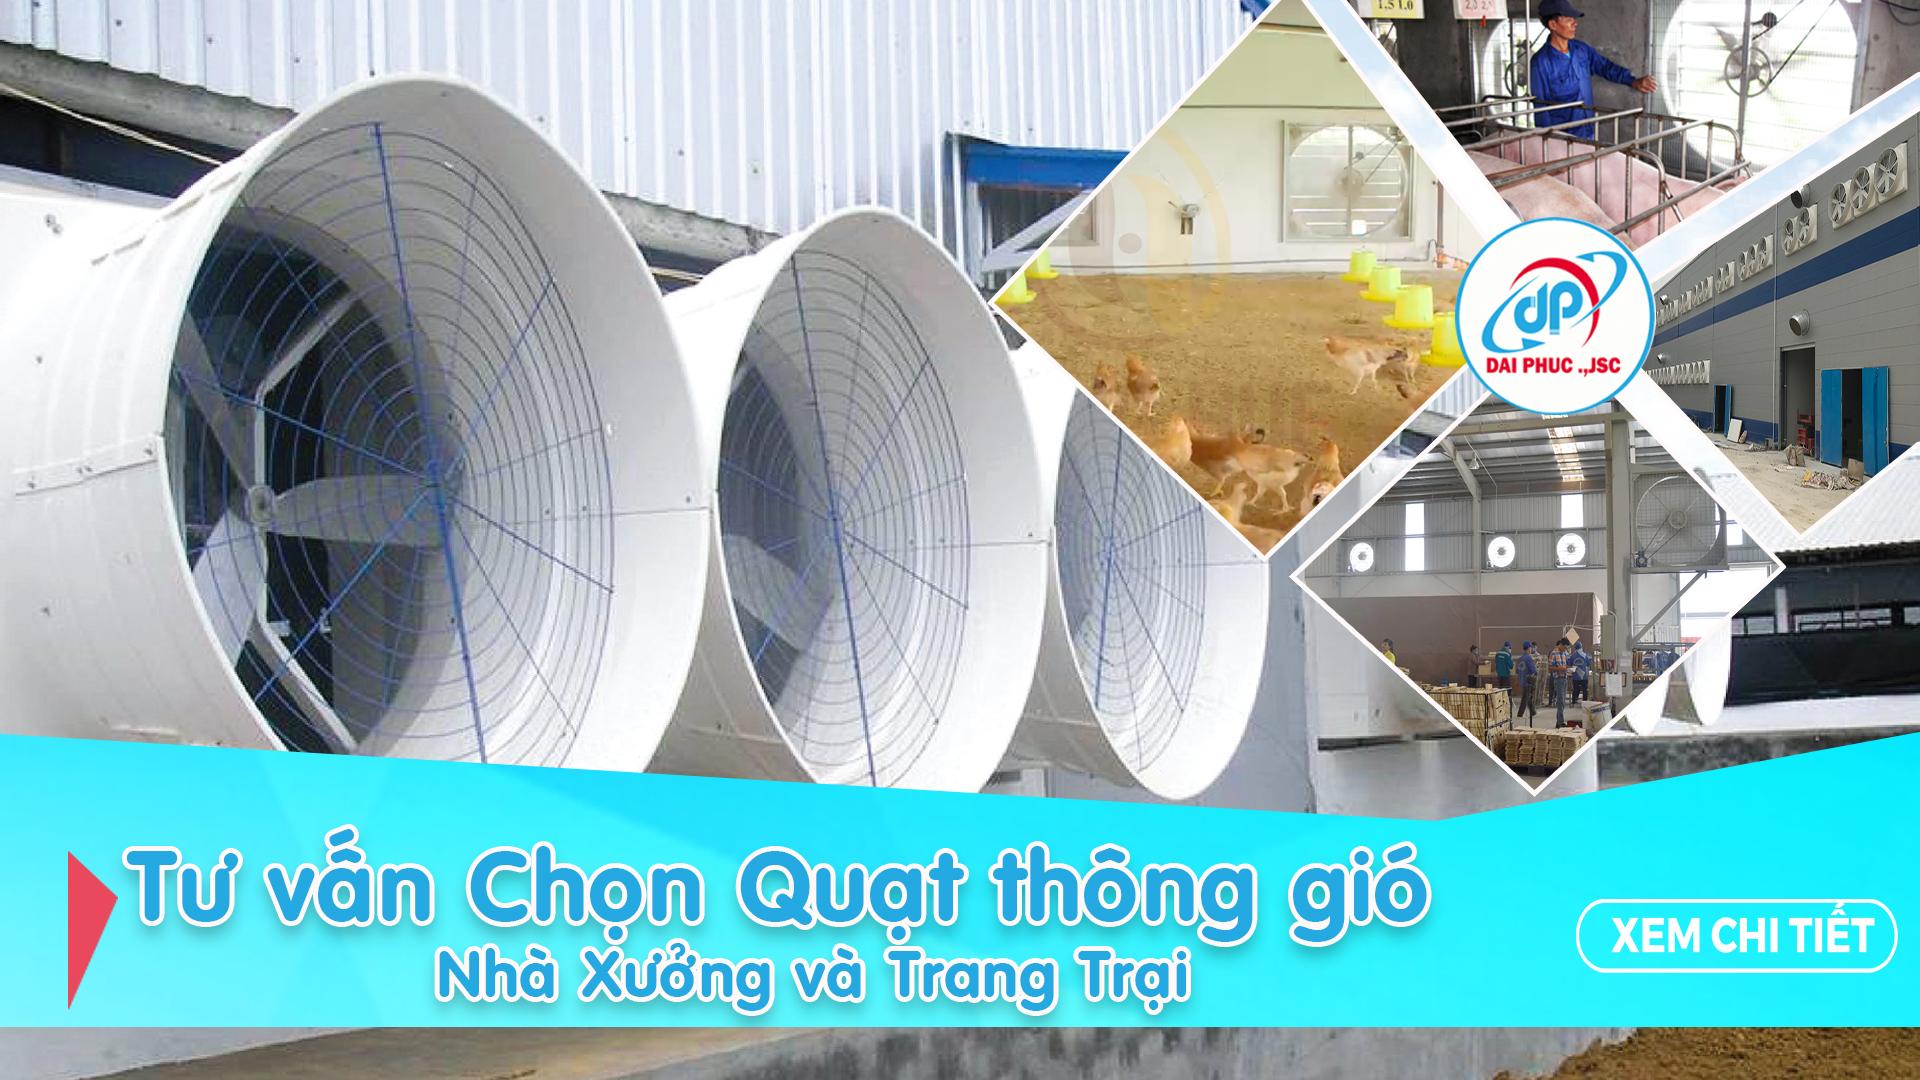 Tu-Van-Chon-Quat-Thong-Gio-Nha-Xuong-Trang-Trai